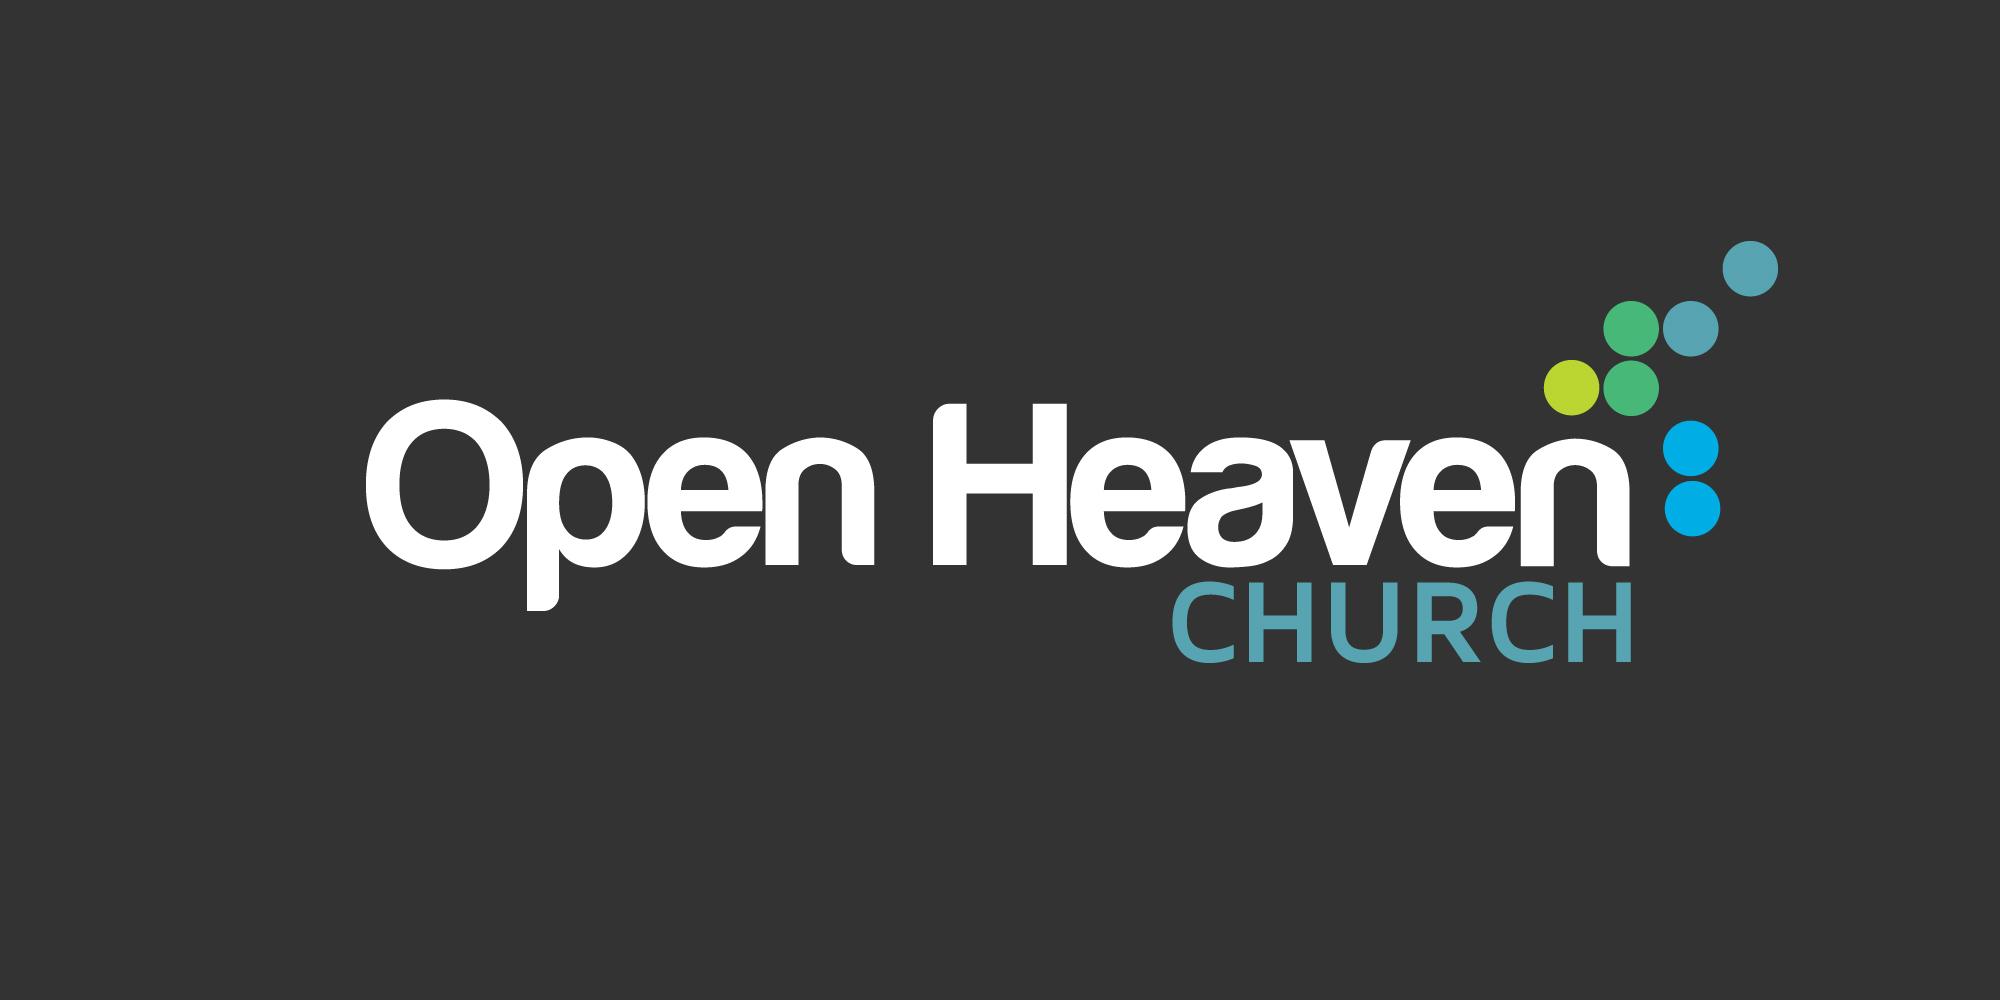 Open Heaven church logo, white logo on dark grey.